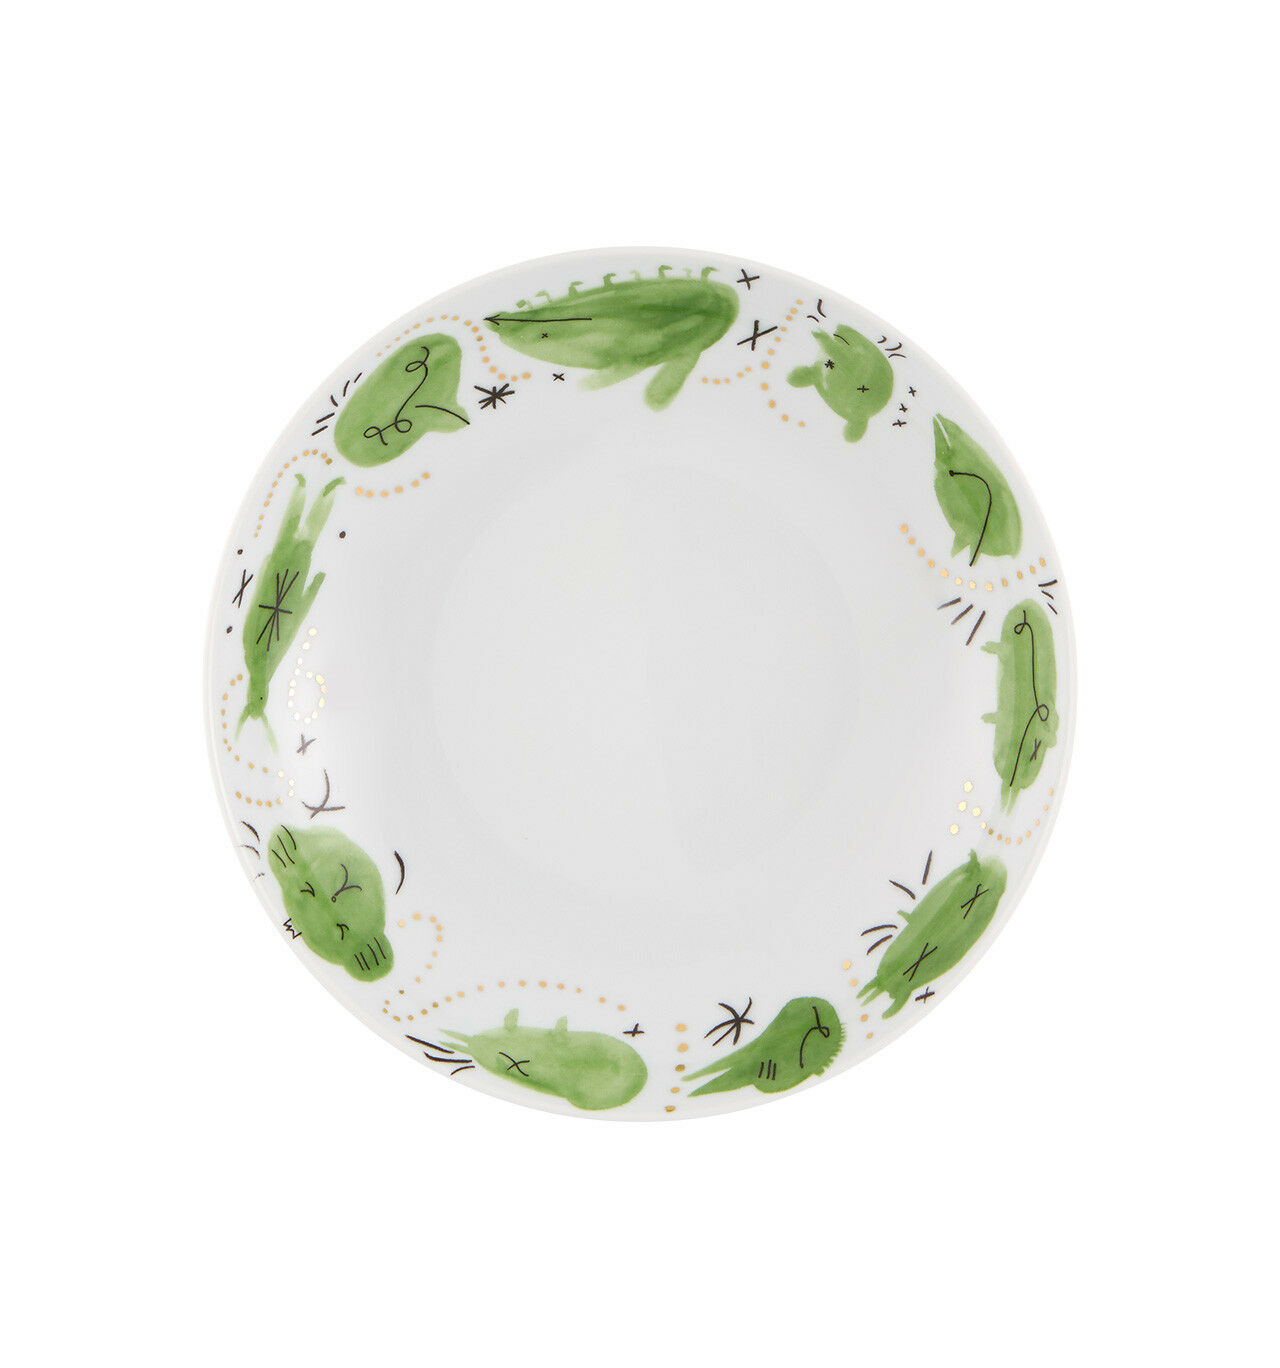 Vista Alegre Folkifunki Soupe Assiette Vert - Ensemble de 8